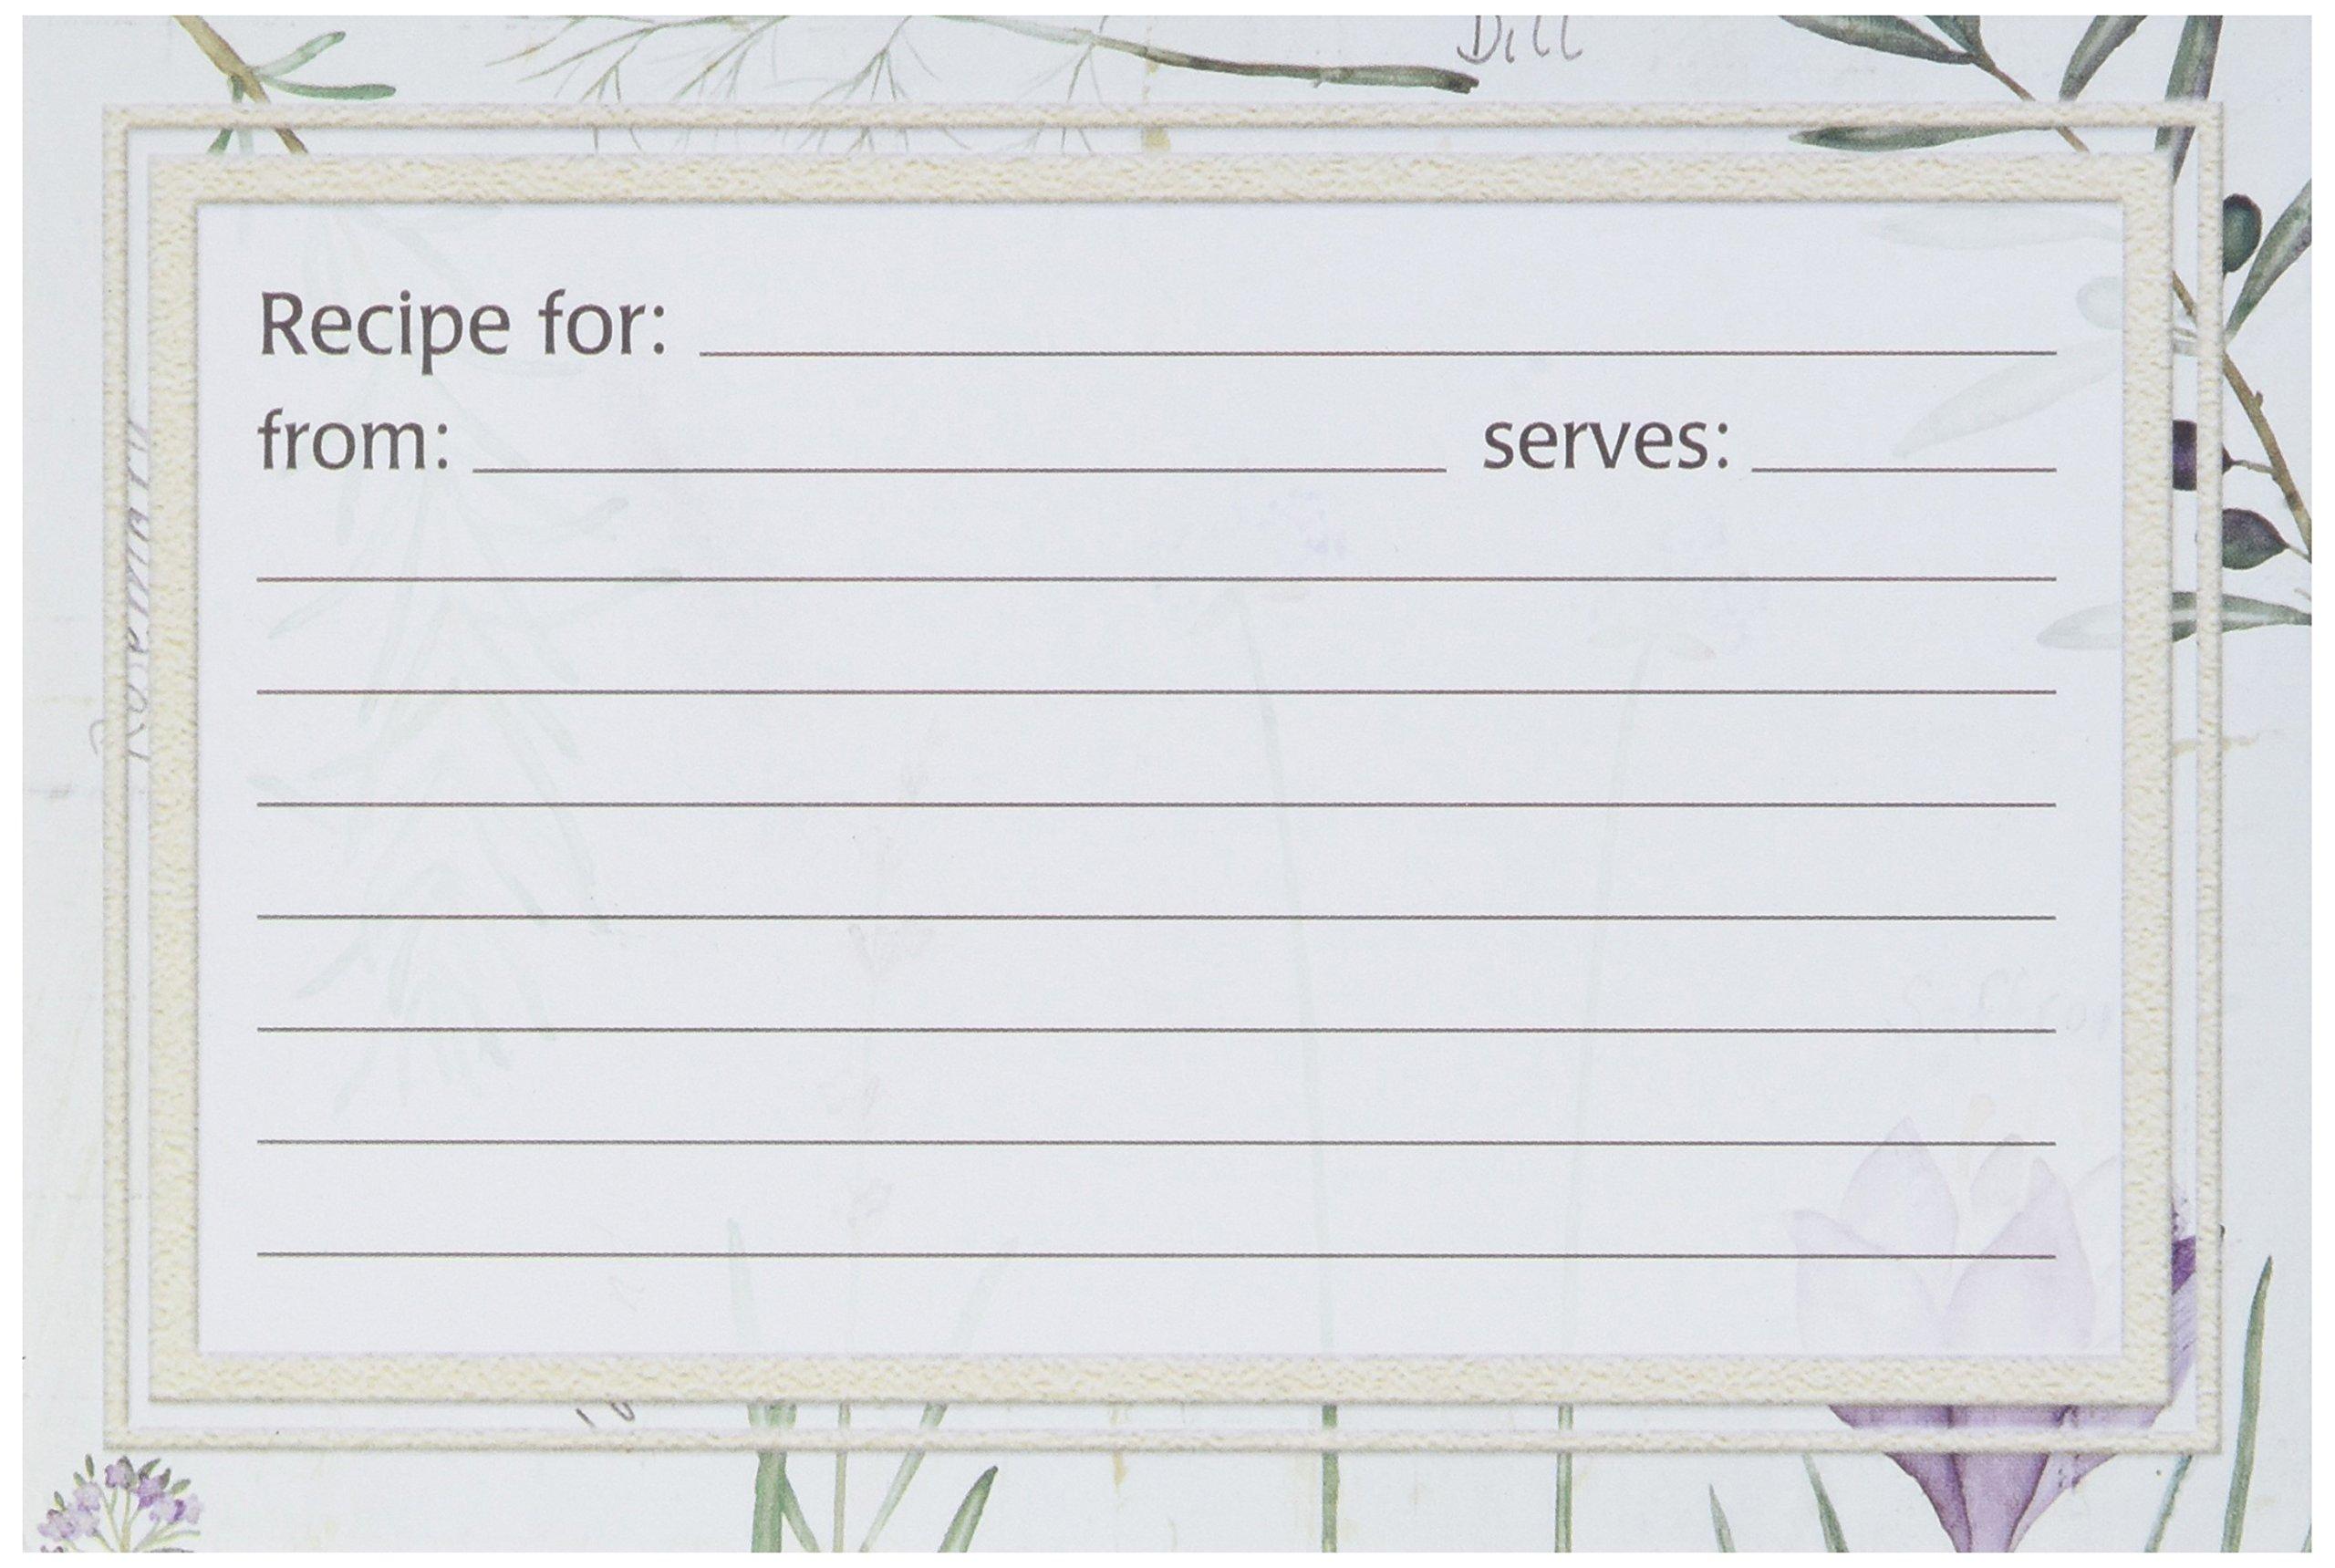 Meadowsweet Kitchens Recipe Card Set - Botanical Treasures